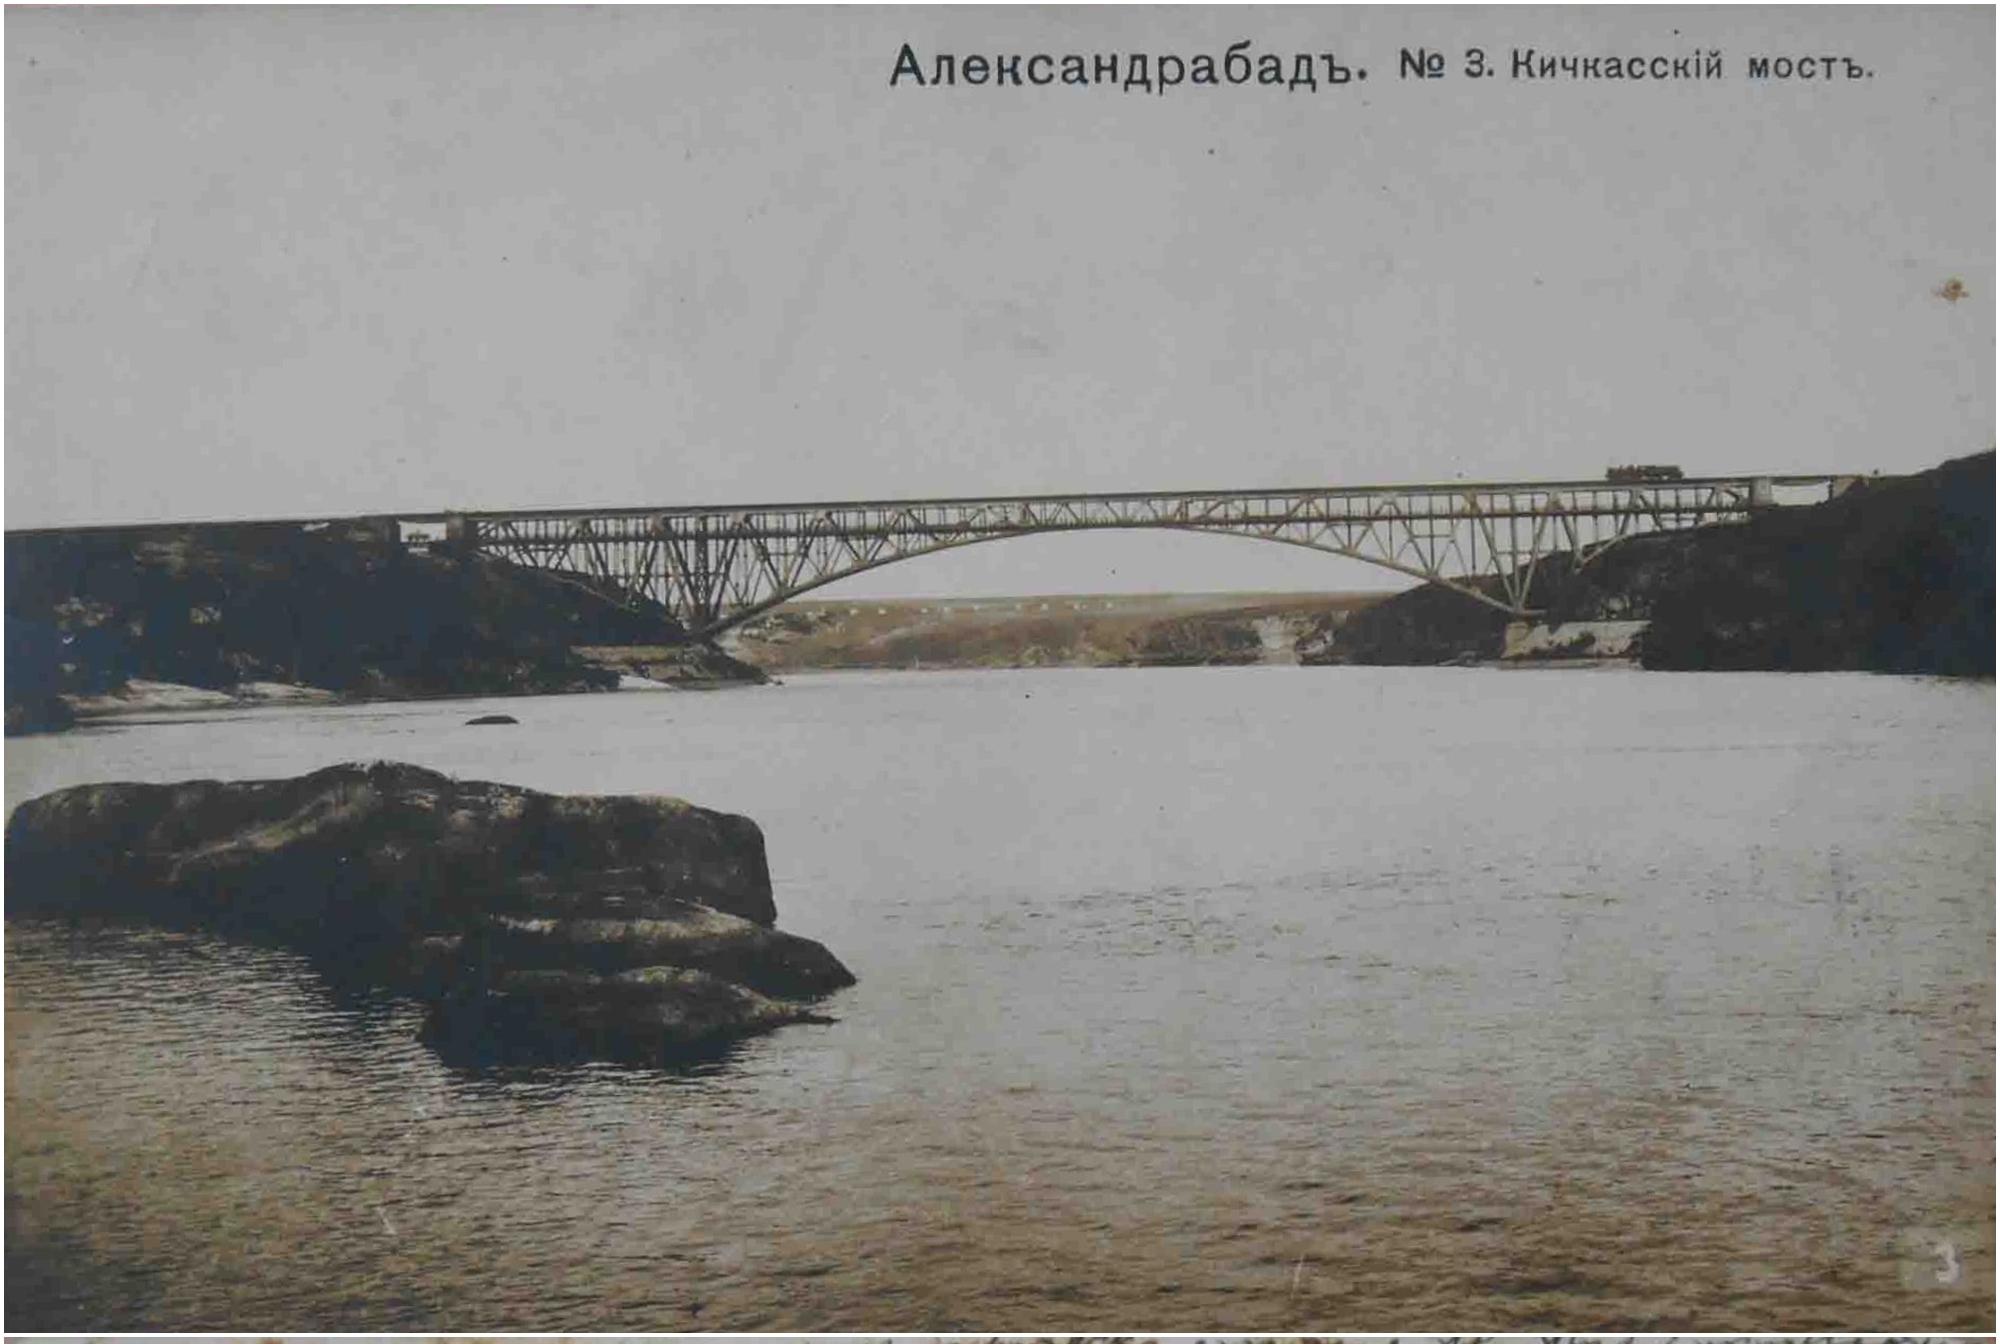 Окрестности Александровска. Александрабад. Кичкасский мост